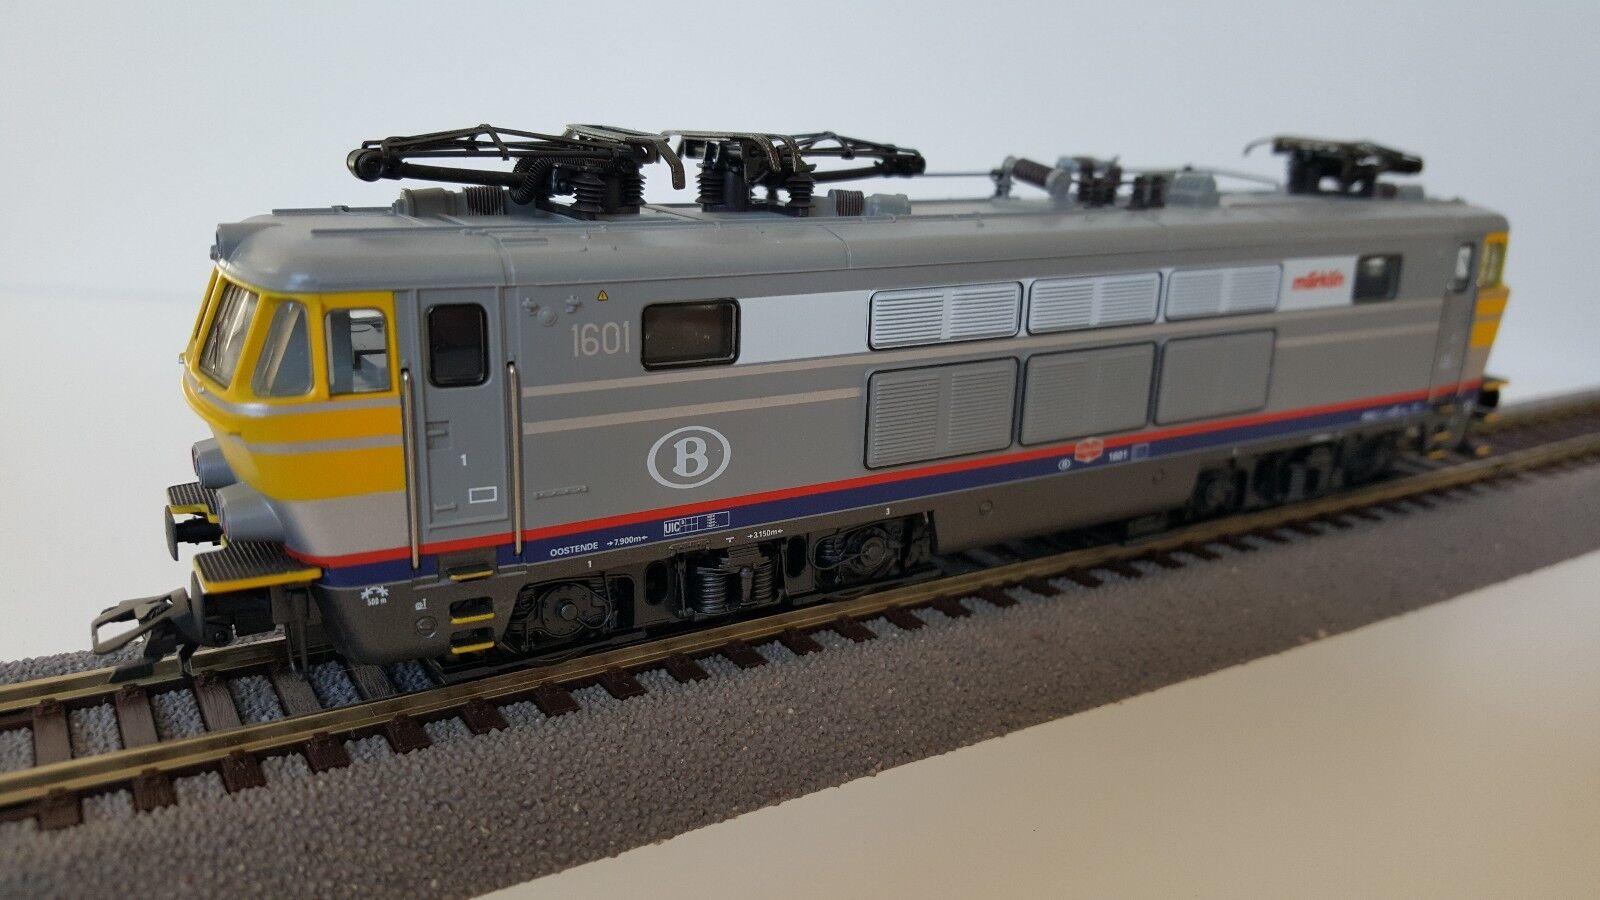 h0 33632 elektrolokomotive serie 1601 delle SNCB in OVP Top